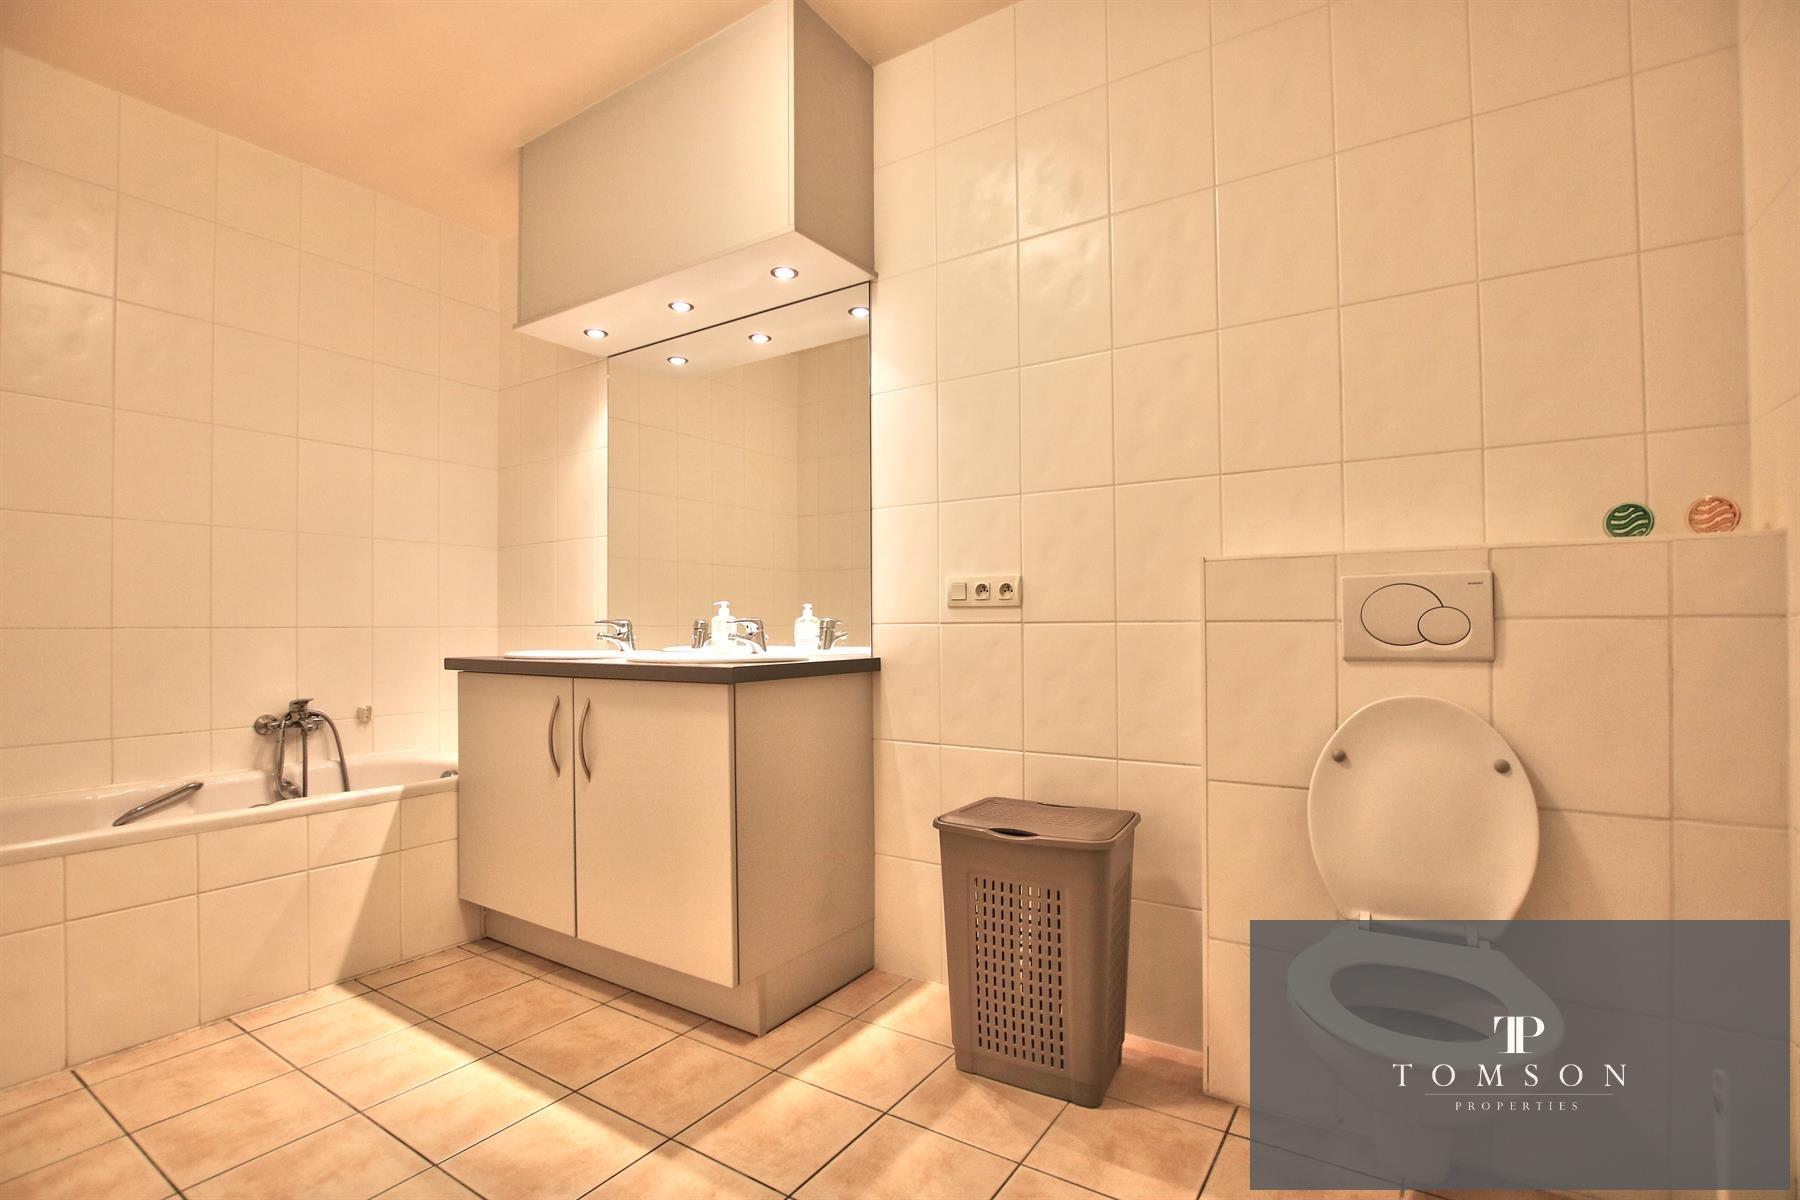 Appartement - Woluwe-Saint-Lambert - #4444905-6